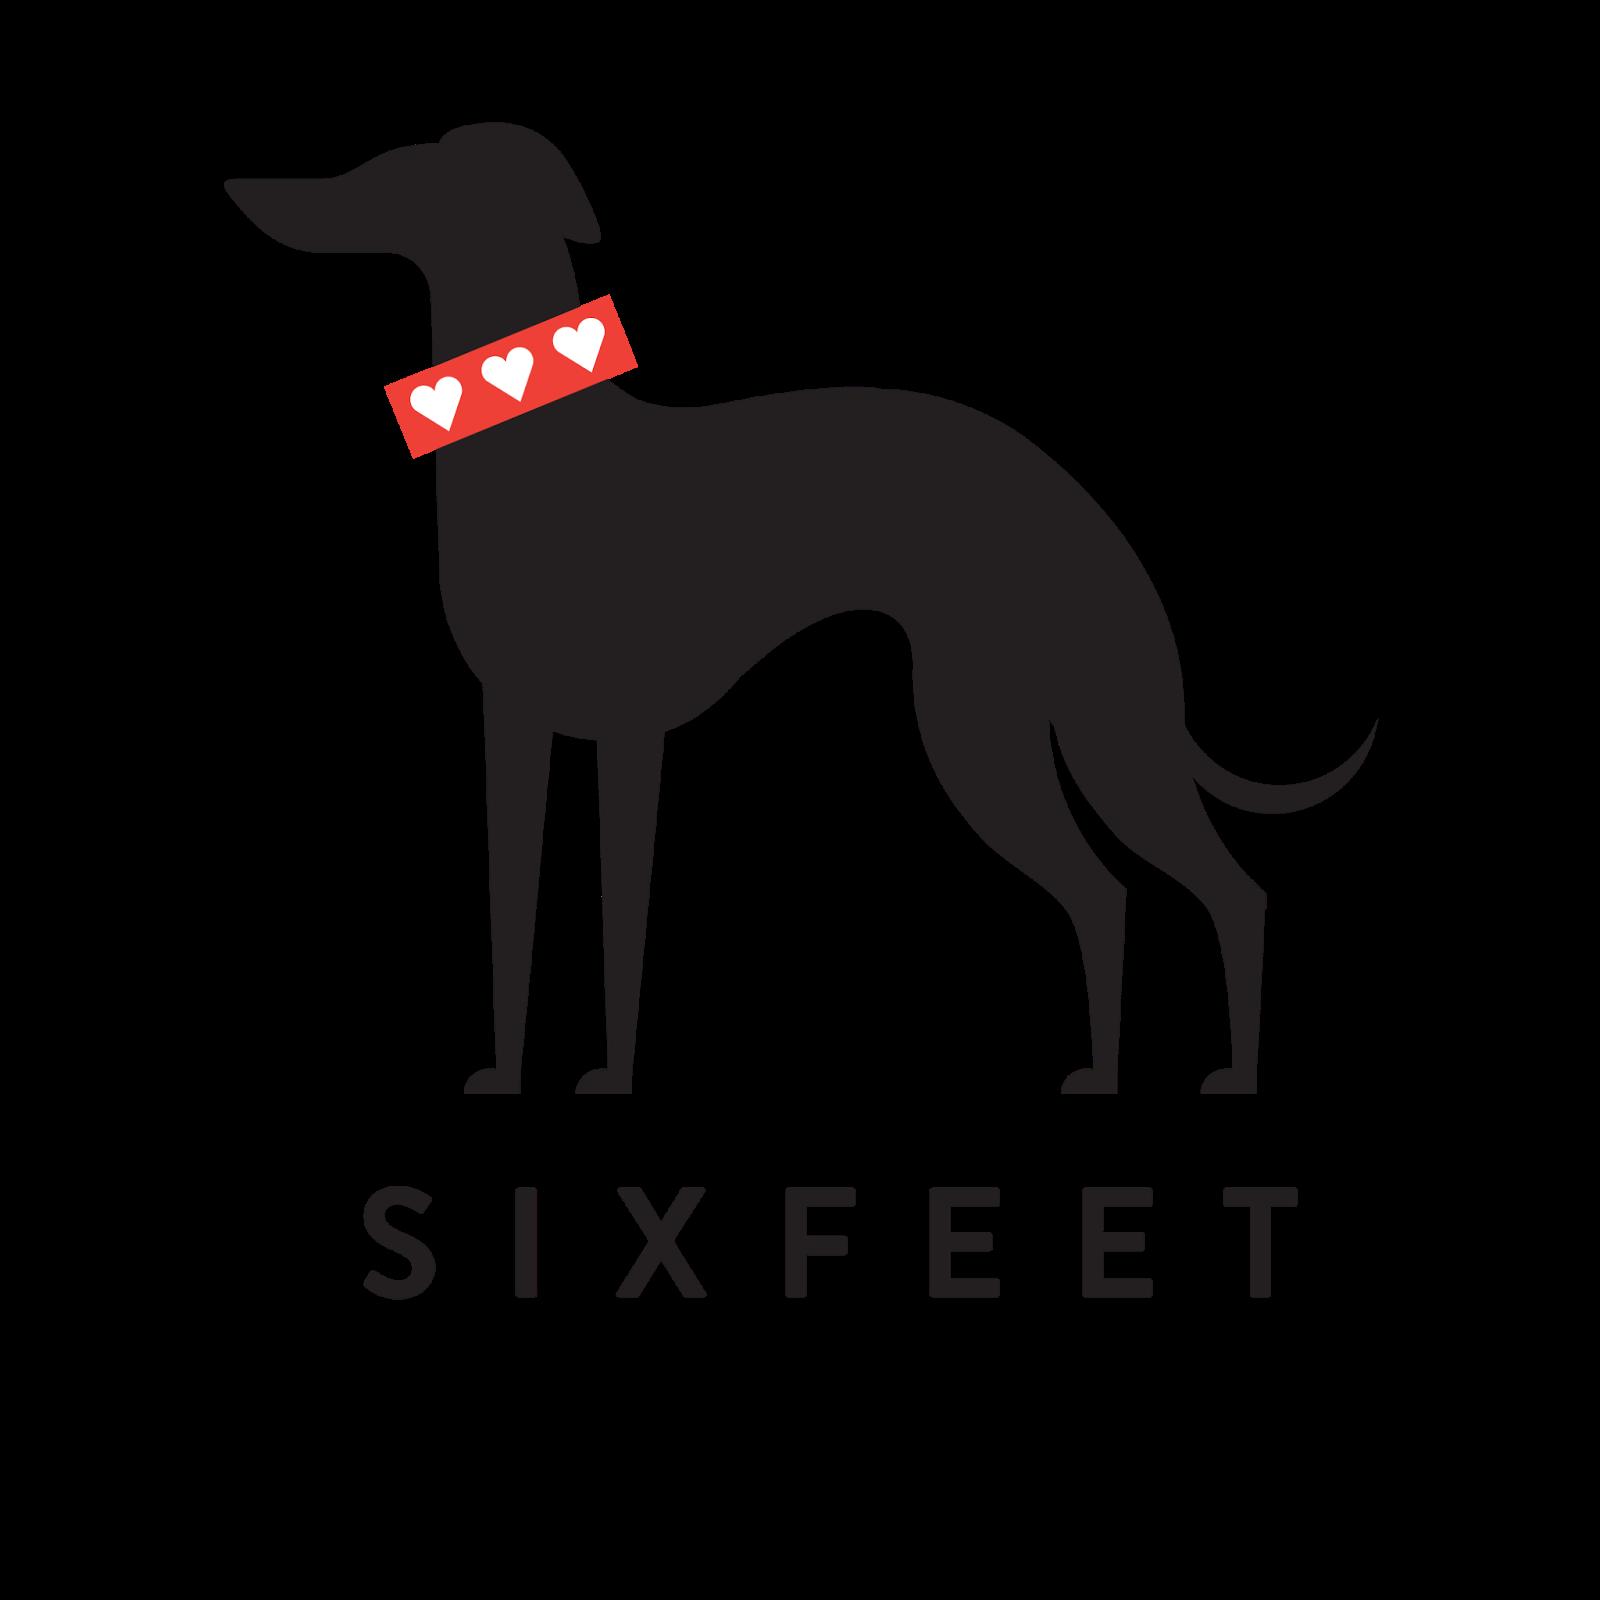 sixfeet_design-01.png